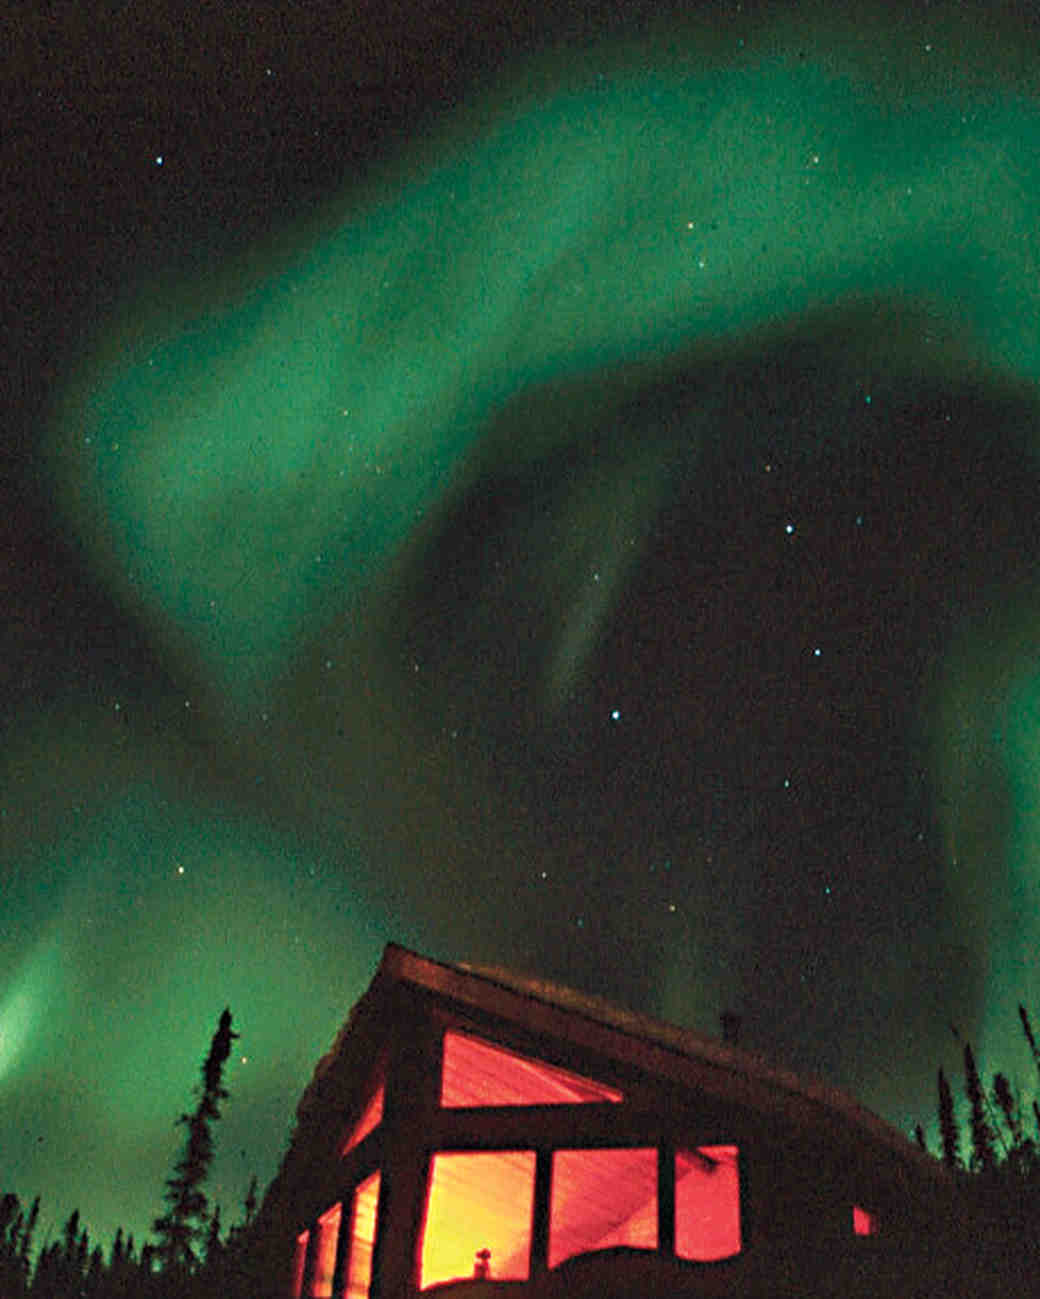 circle-aurora-over-aurorarium-mws109850.jpg